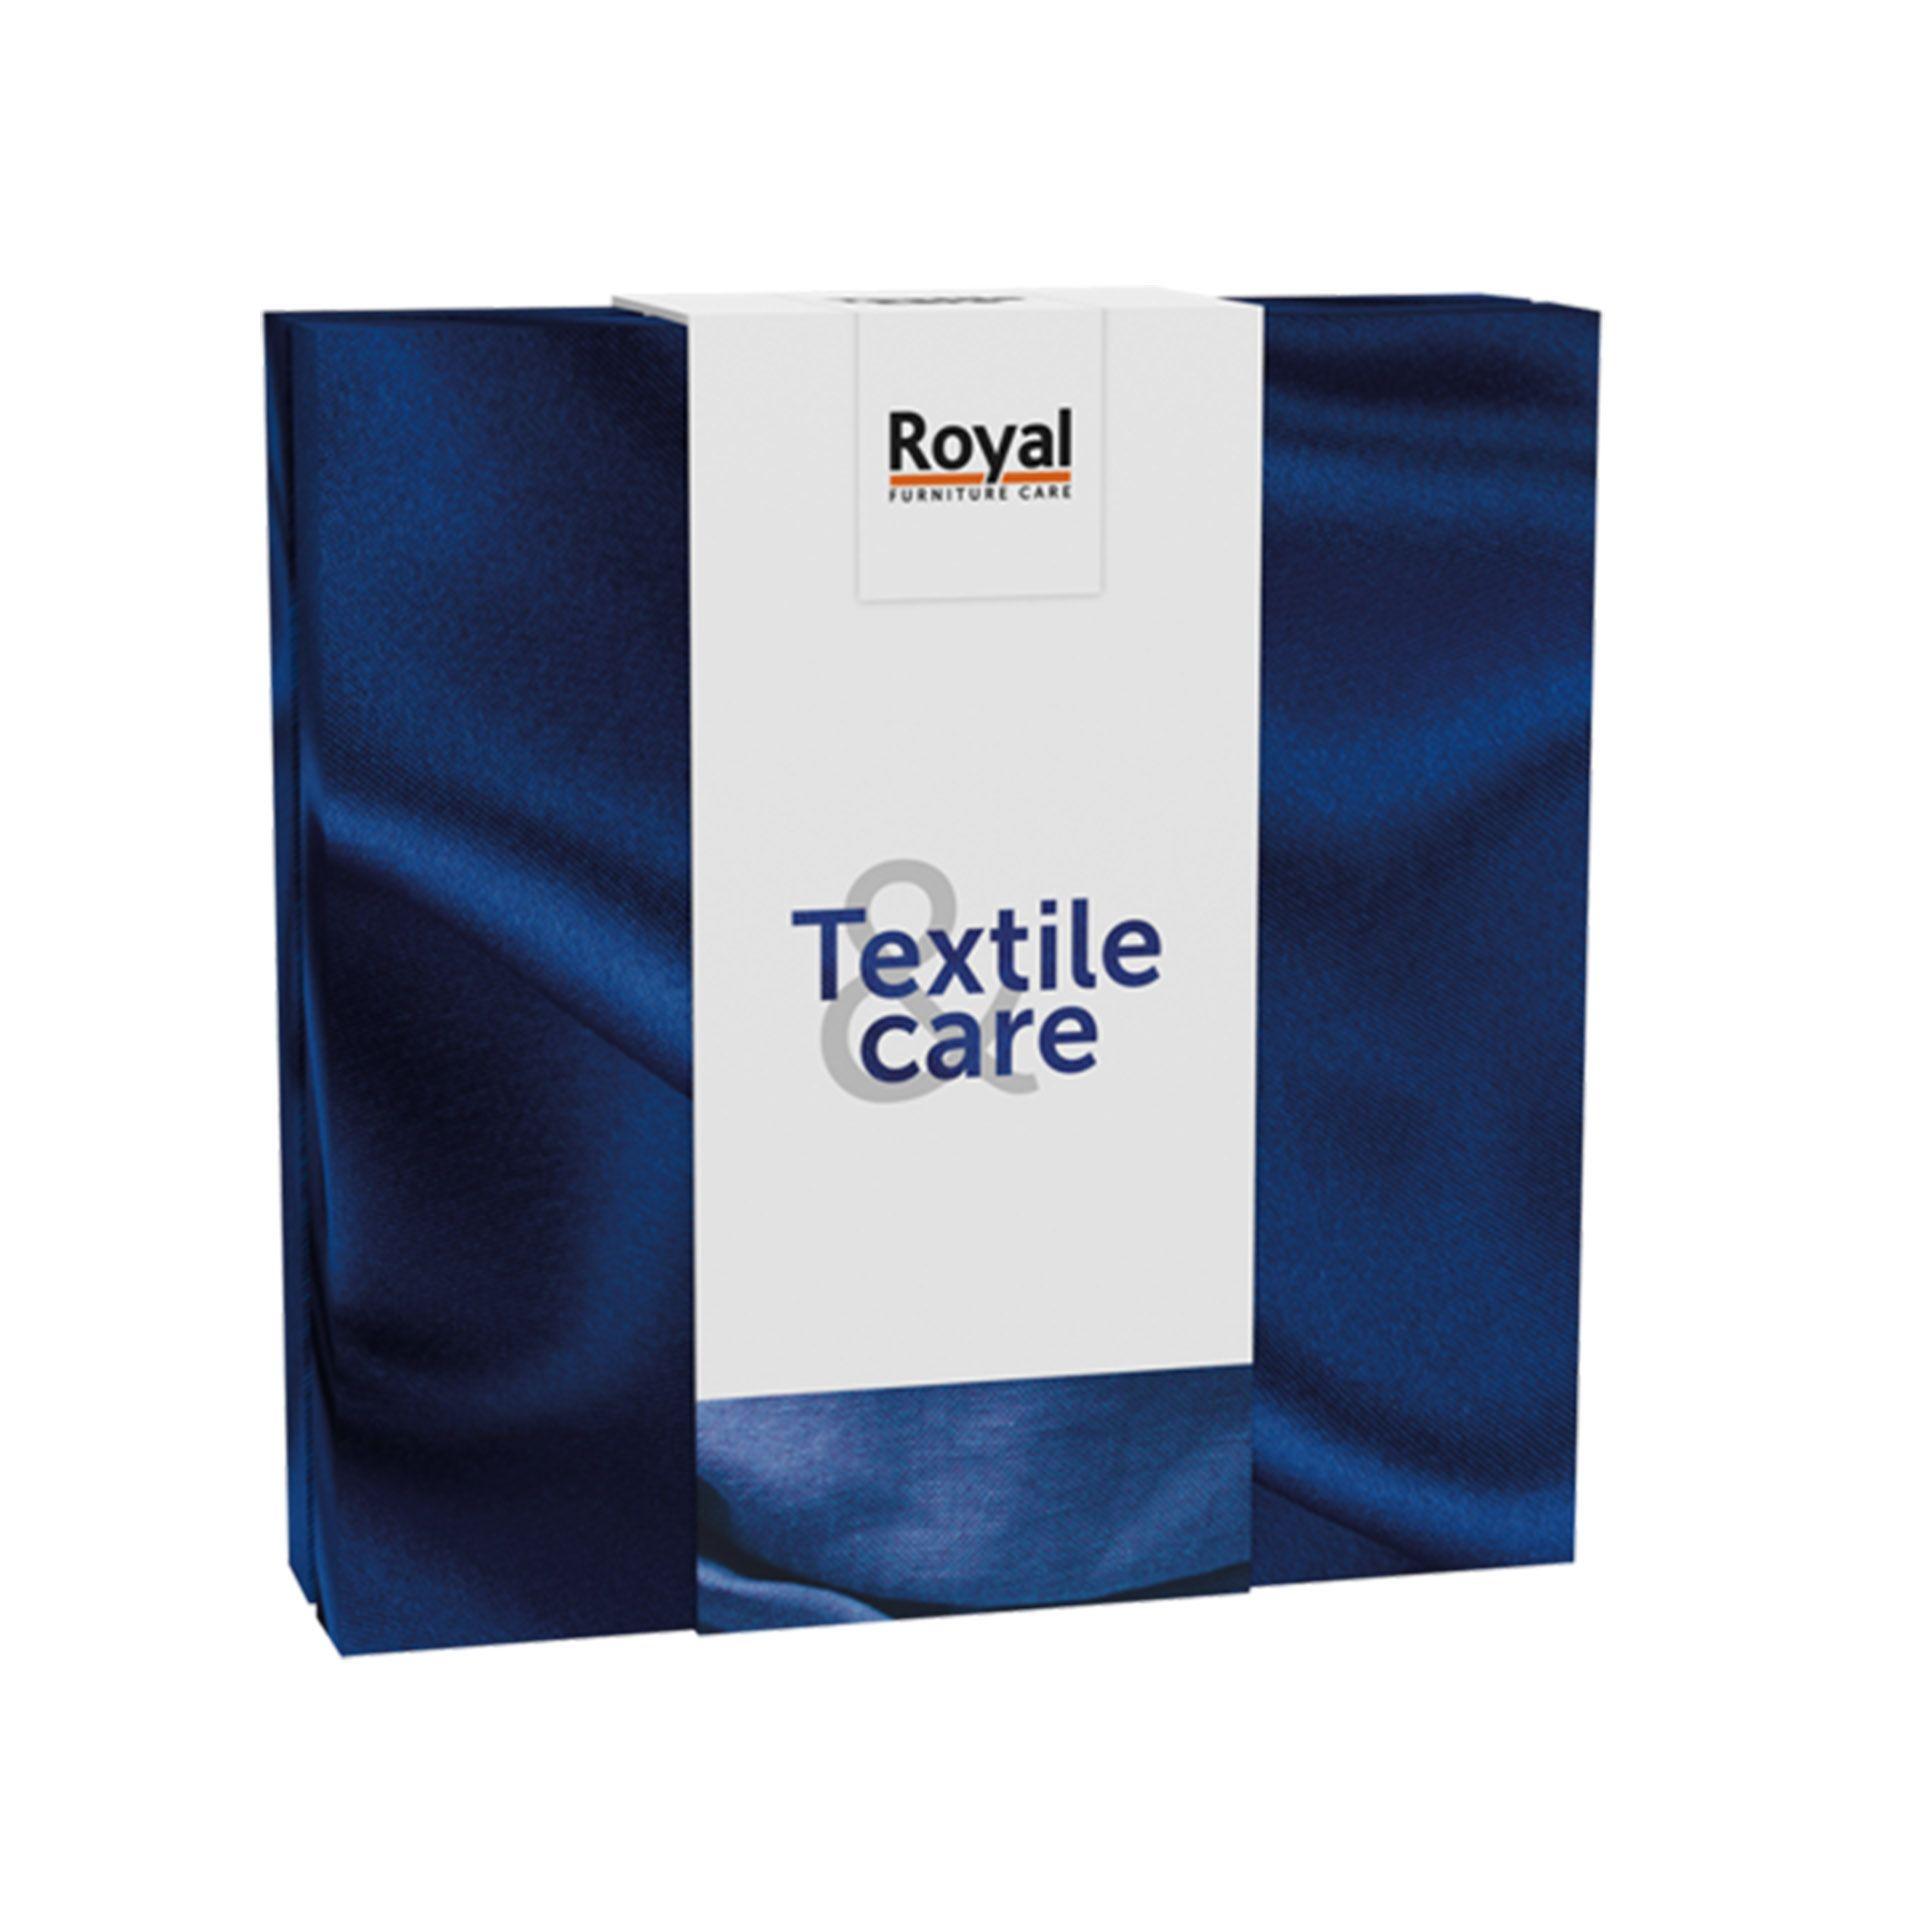 Premium Care Kit - Clean & Protect